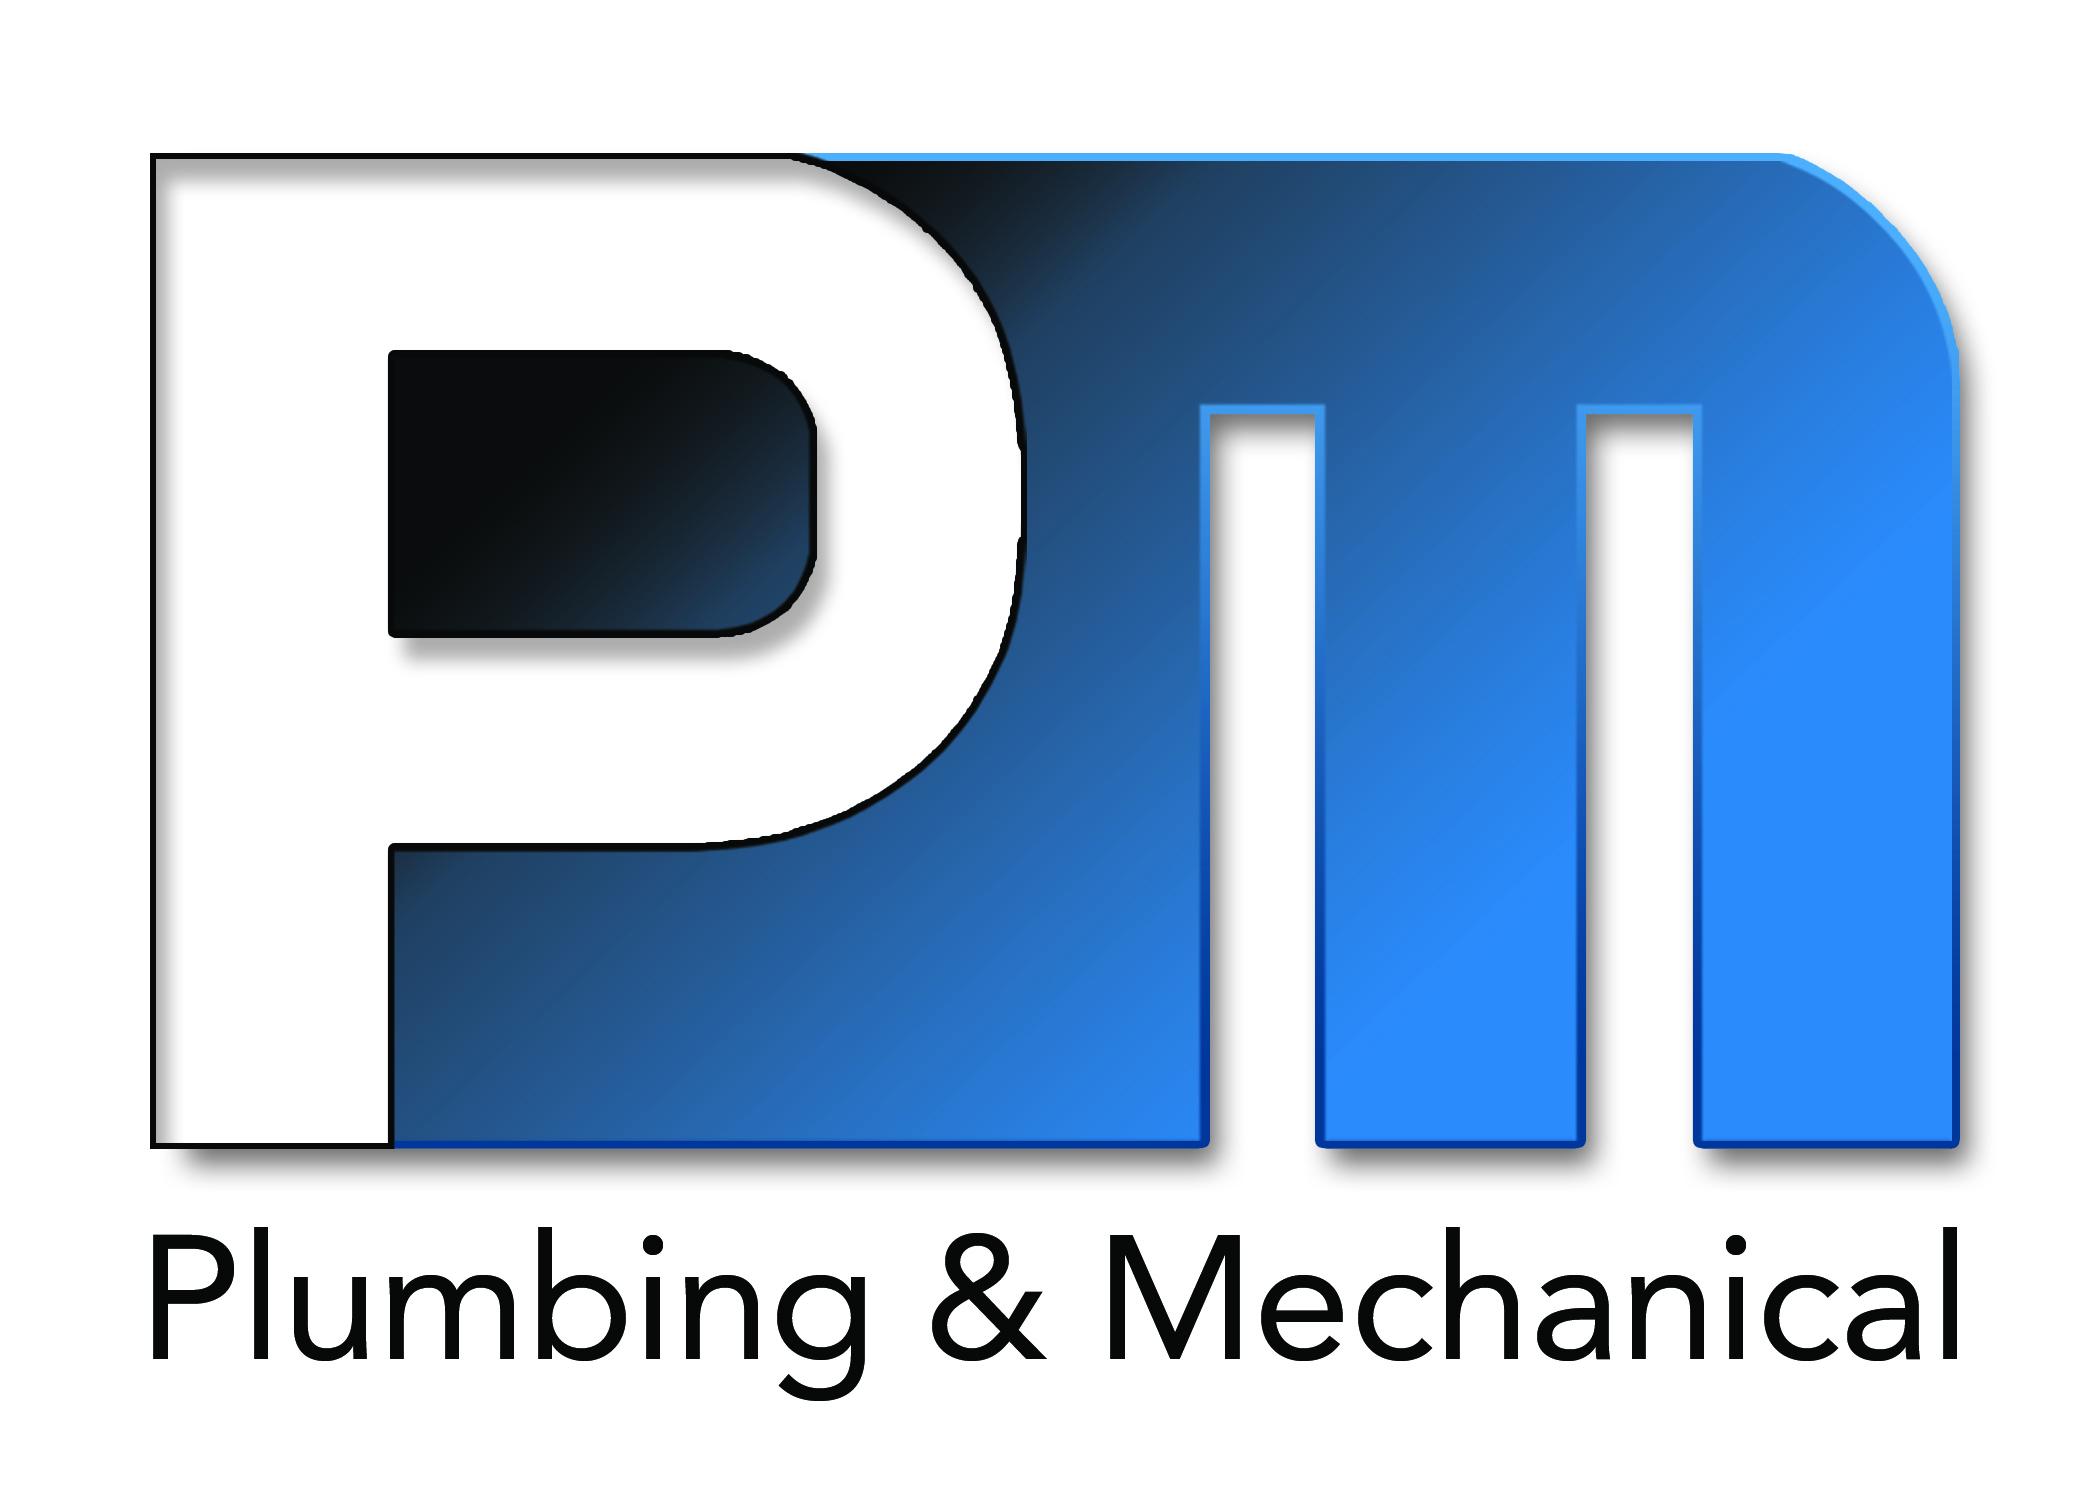 P M Plumbing & Mechanical - YP.com